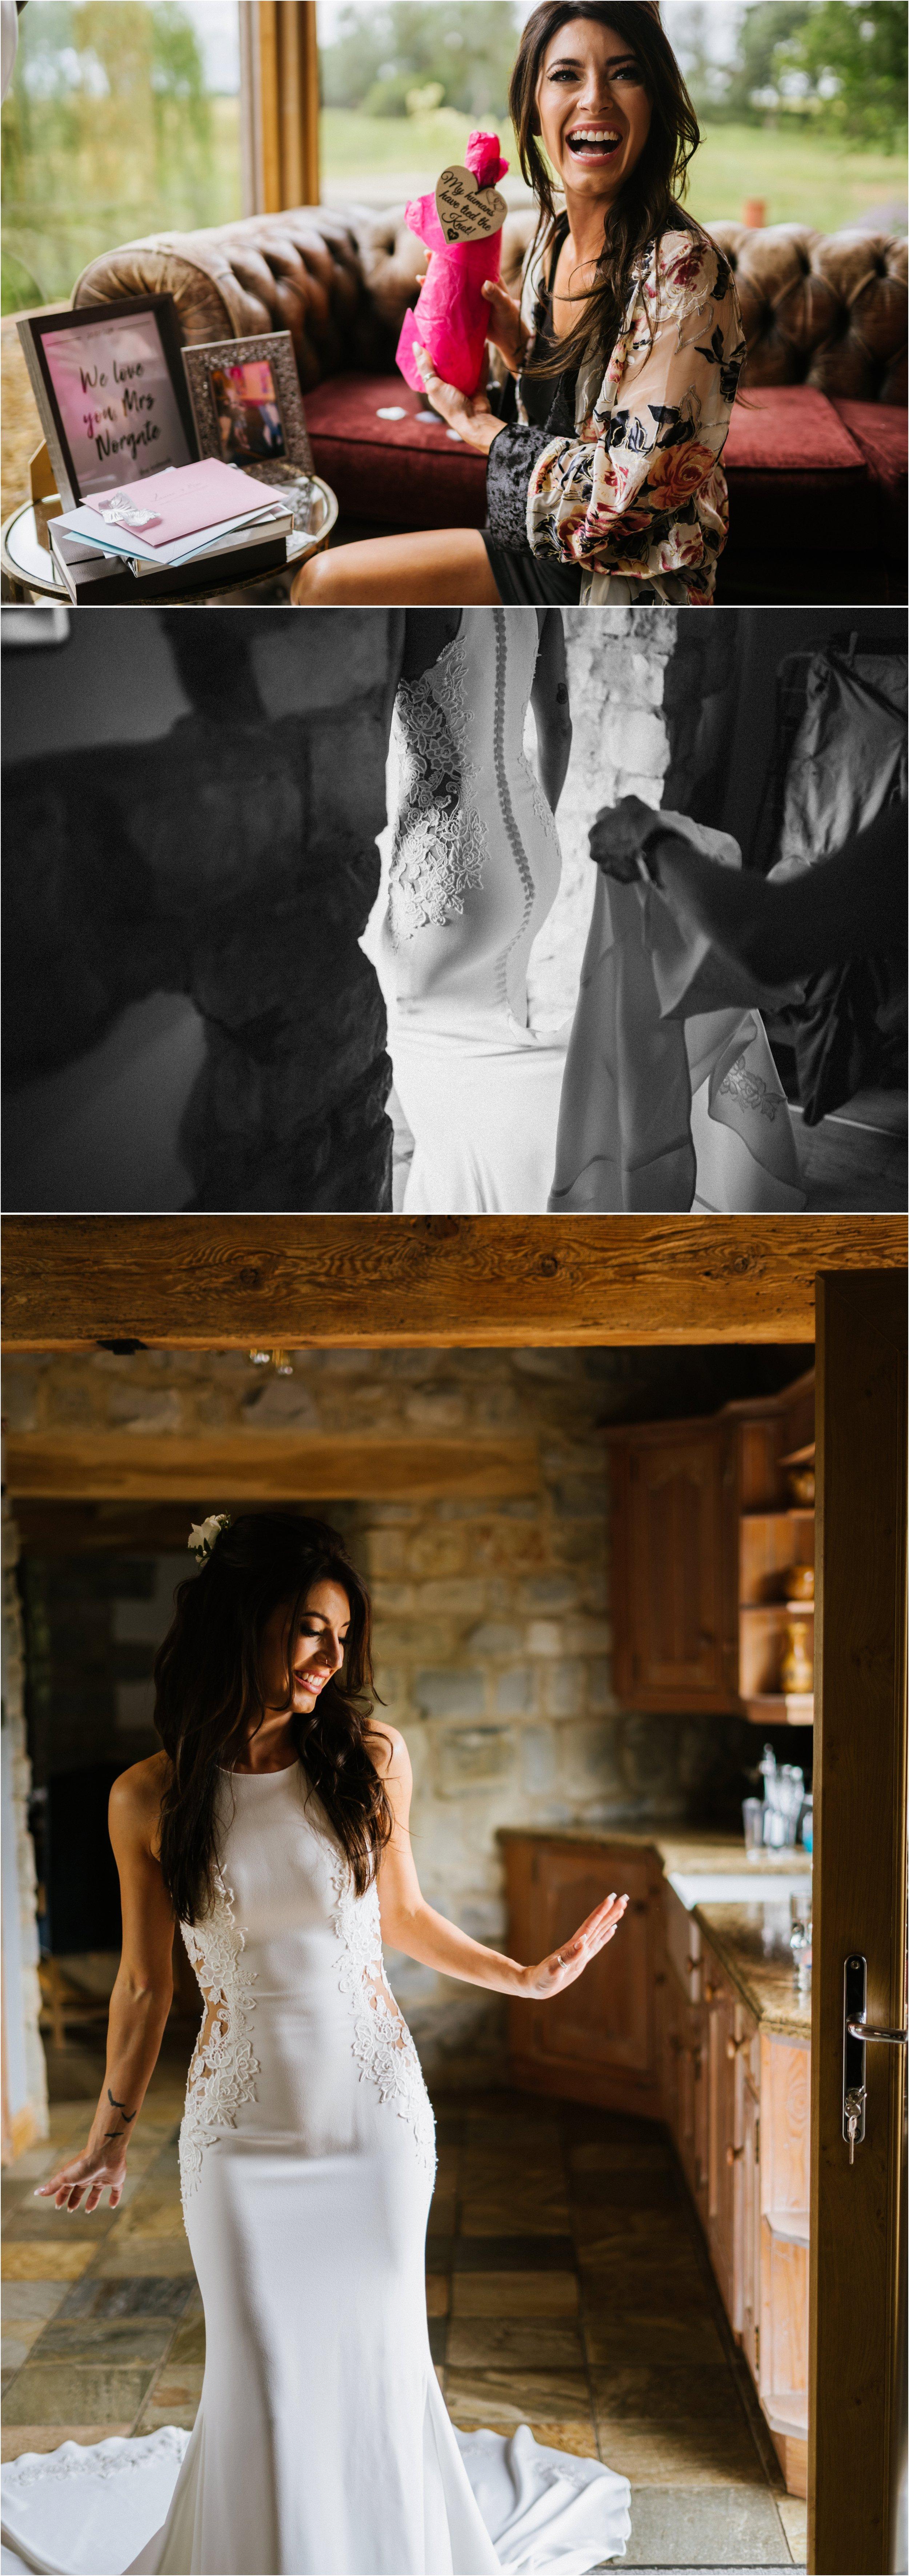 Compton Verney wedding photography_0023.jpg